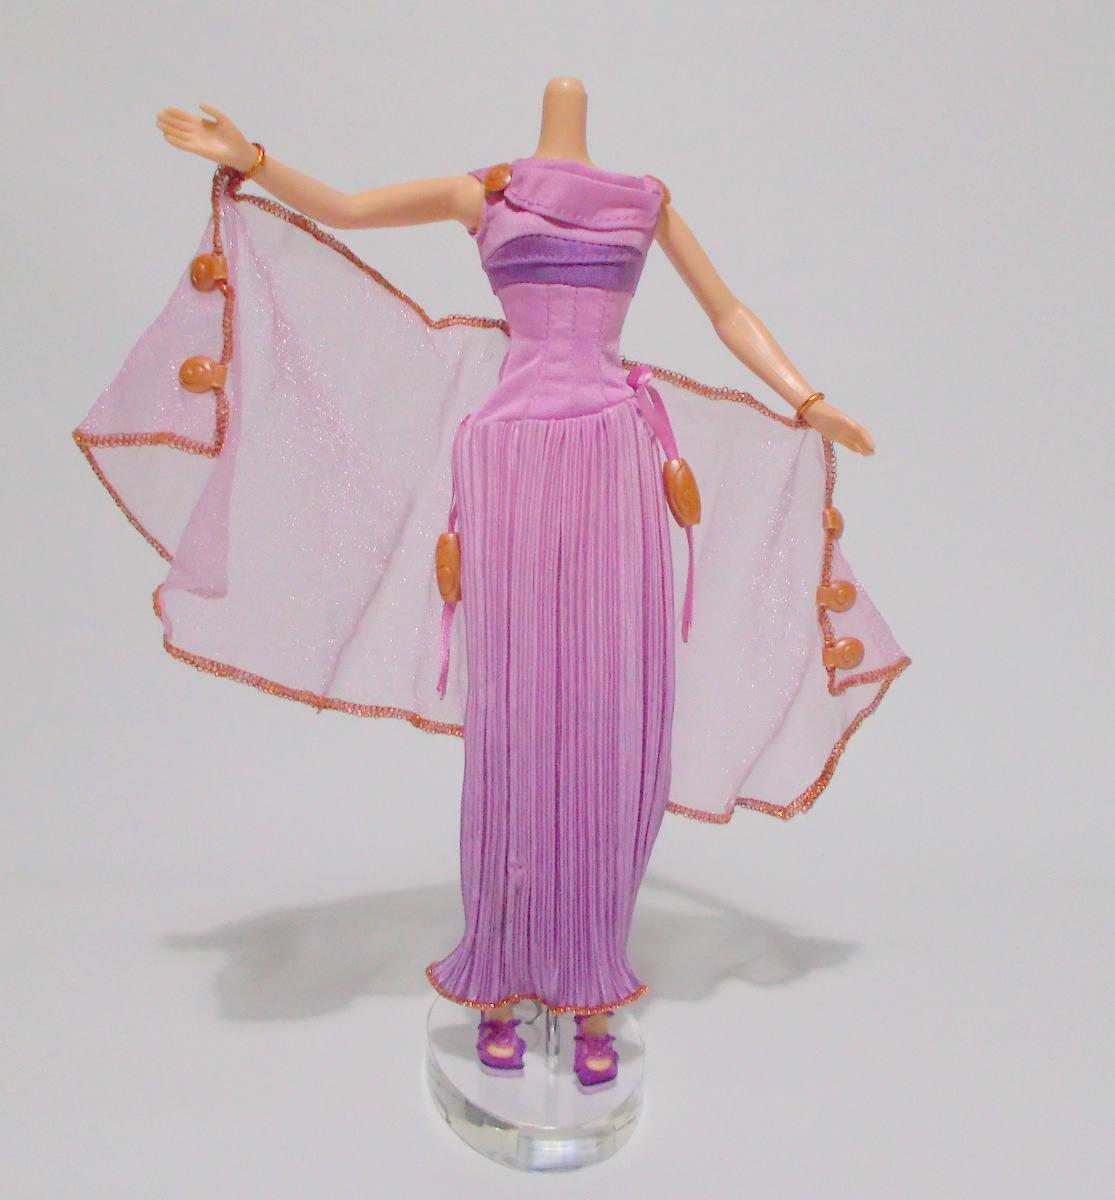 Disney Megara muñeca vestido moda Hércules púrpura falda